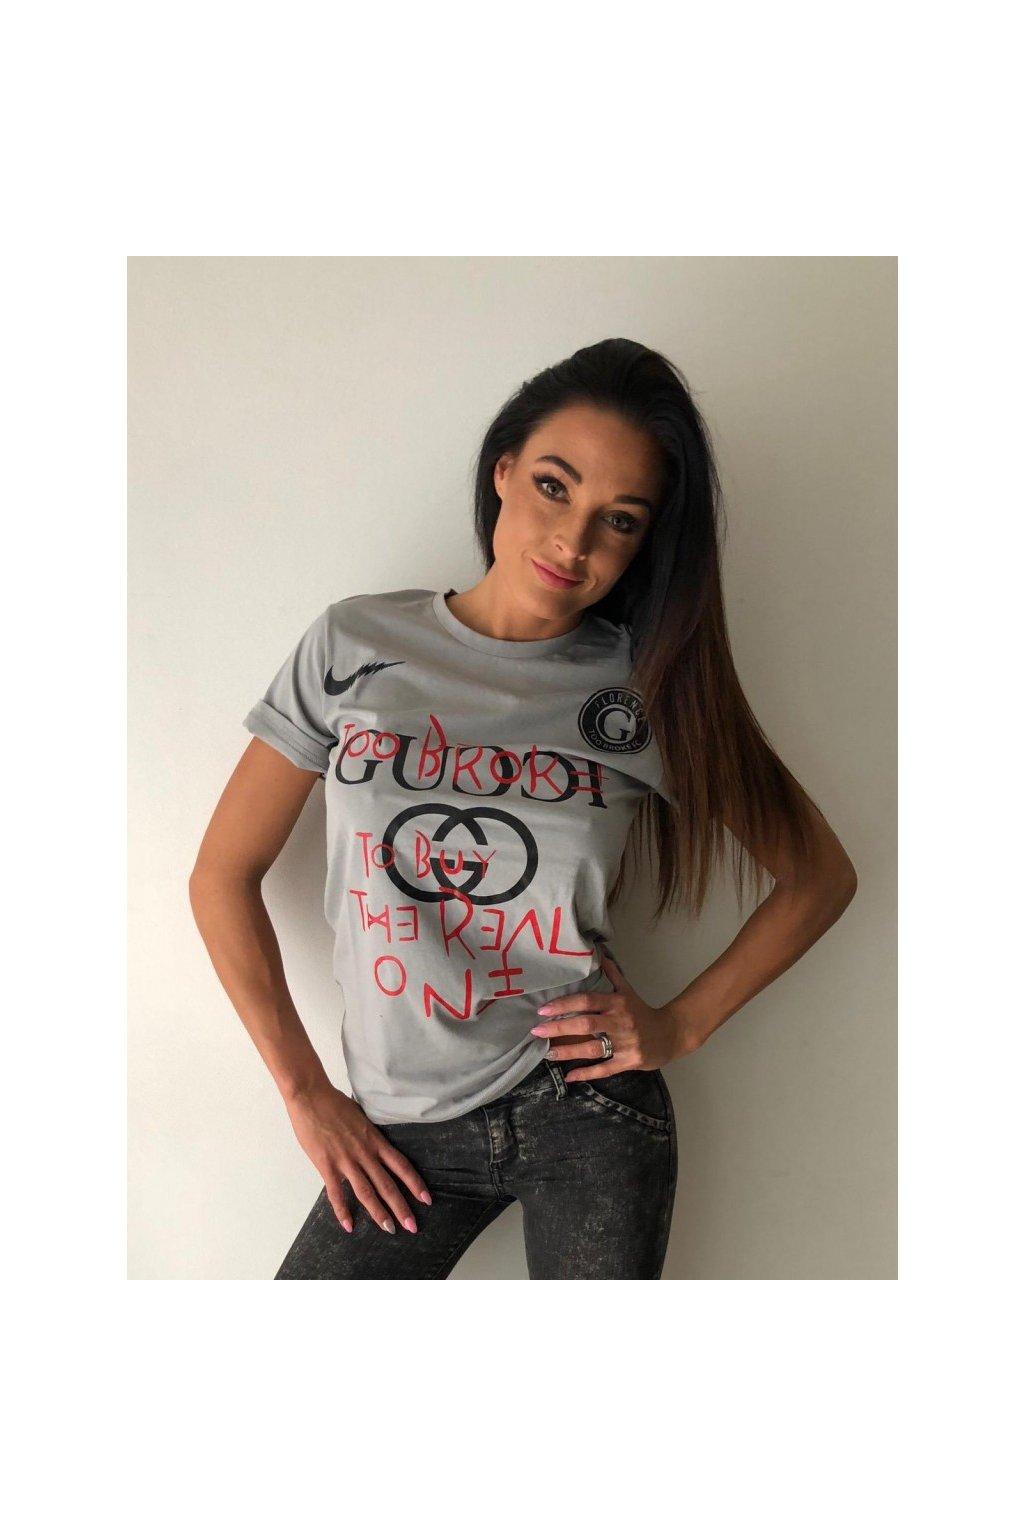 Tričko TooBroke s nápisem Gucci - šedé (Velikost Velikost XS)